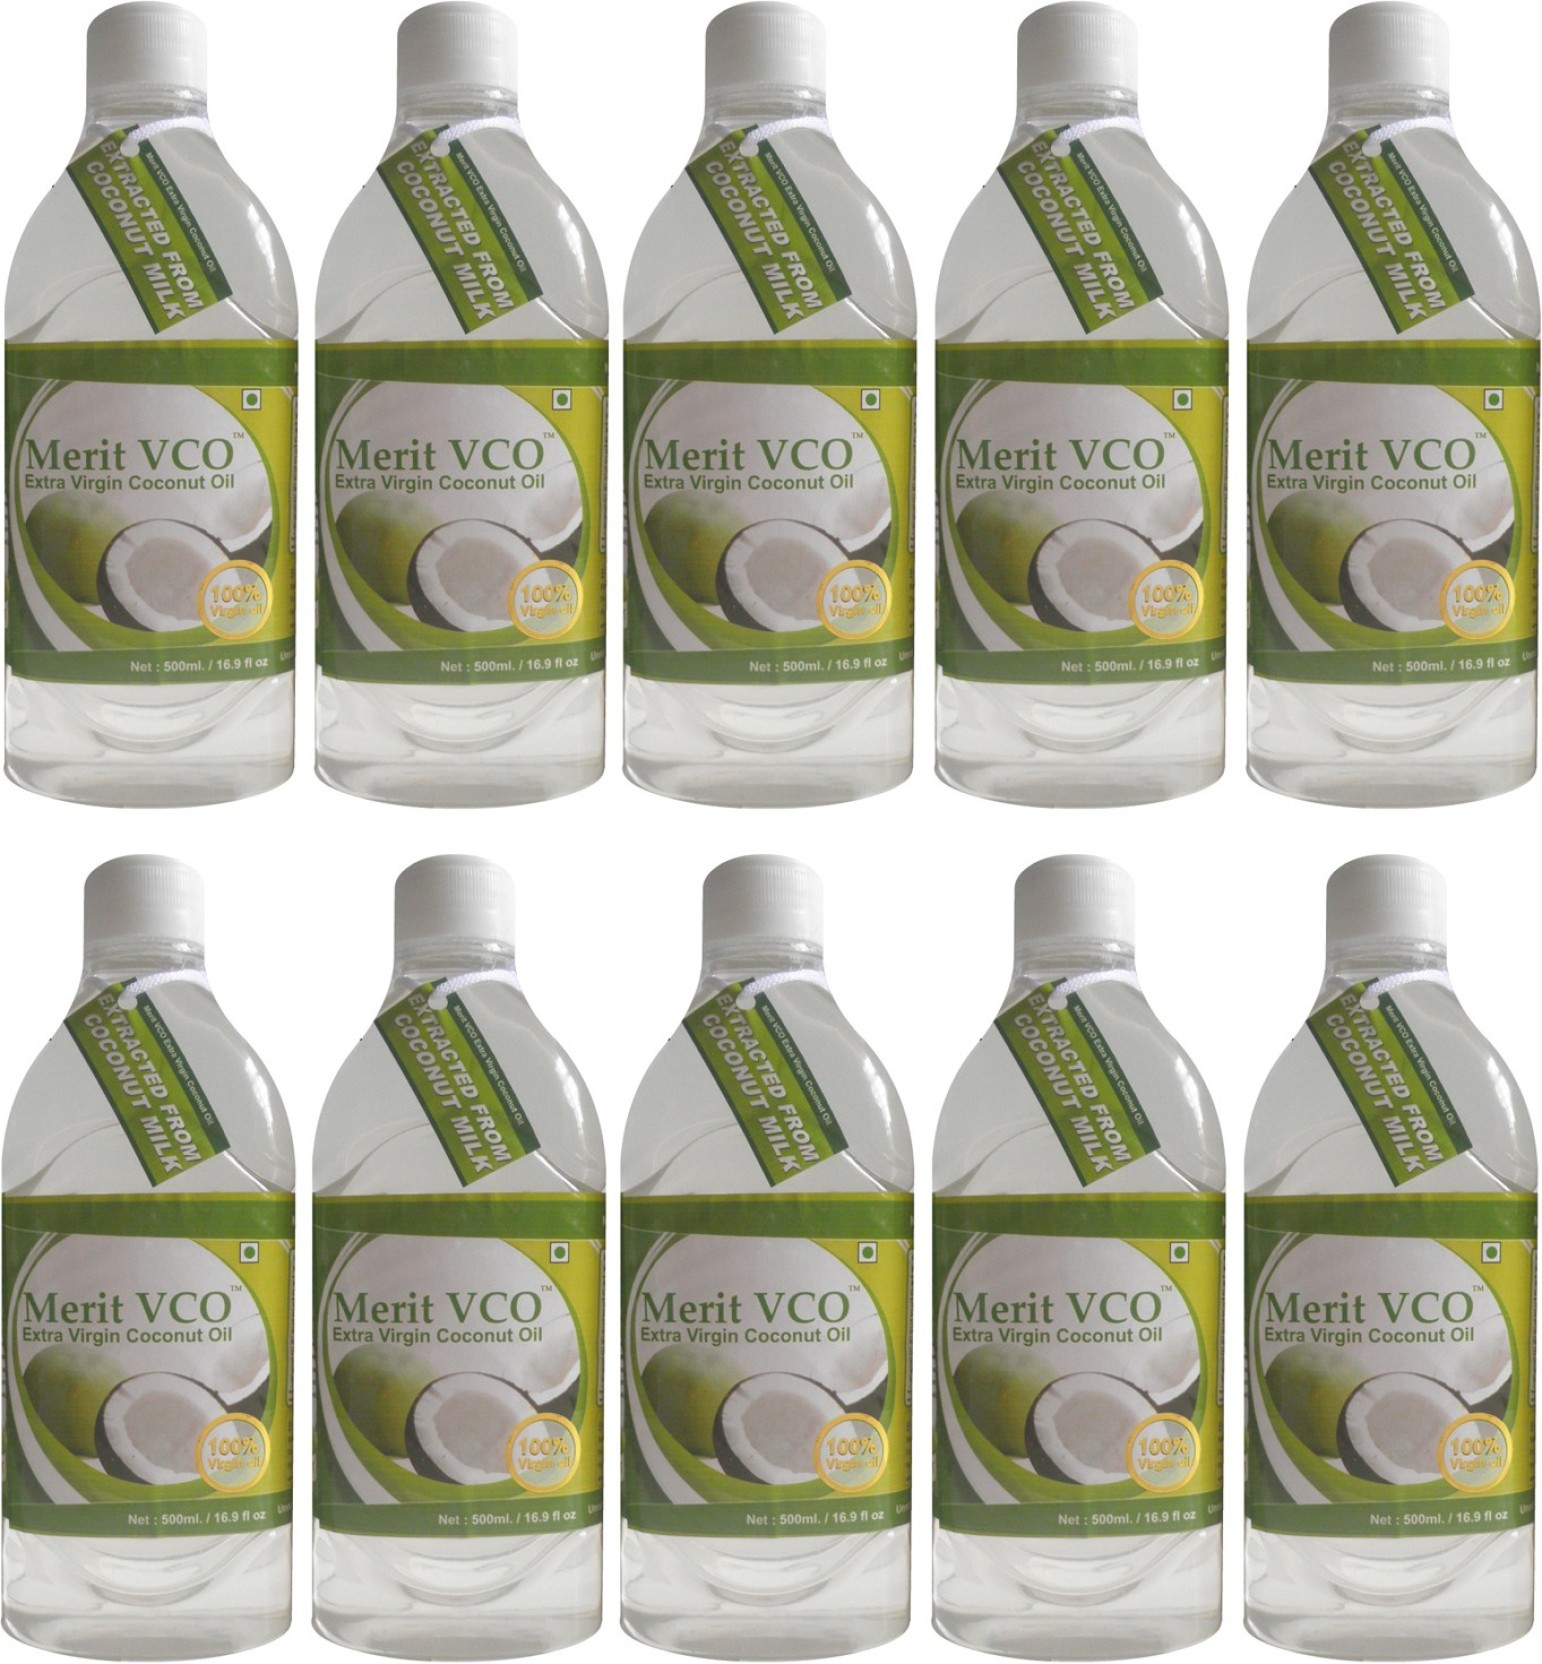 Healthylife Extra Virgin Coconut Oil Vco 100 Organic Cold Pressed Lemonilo 250 Ml Merit Pack Of 10 Share